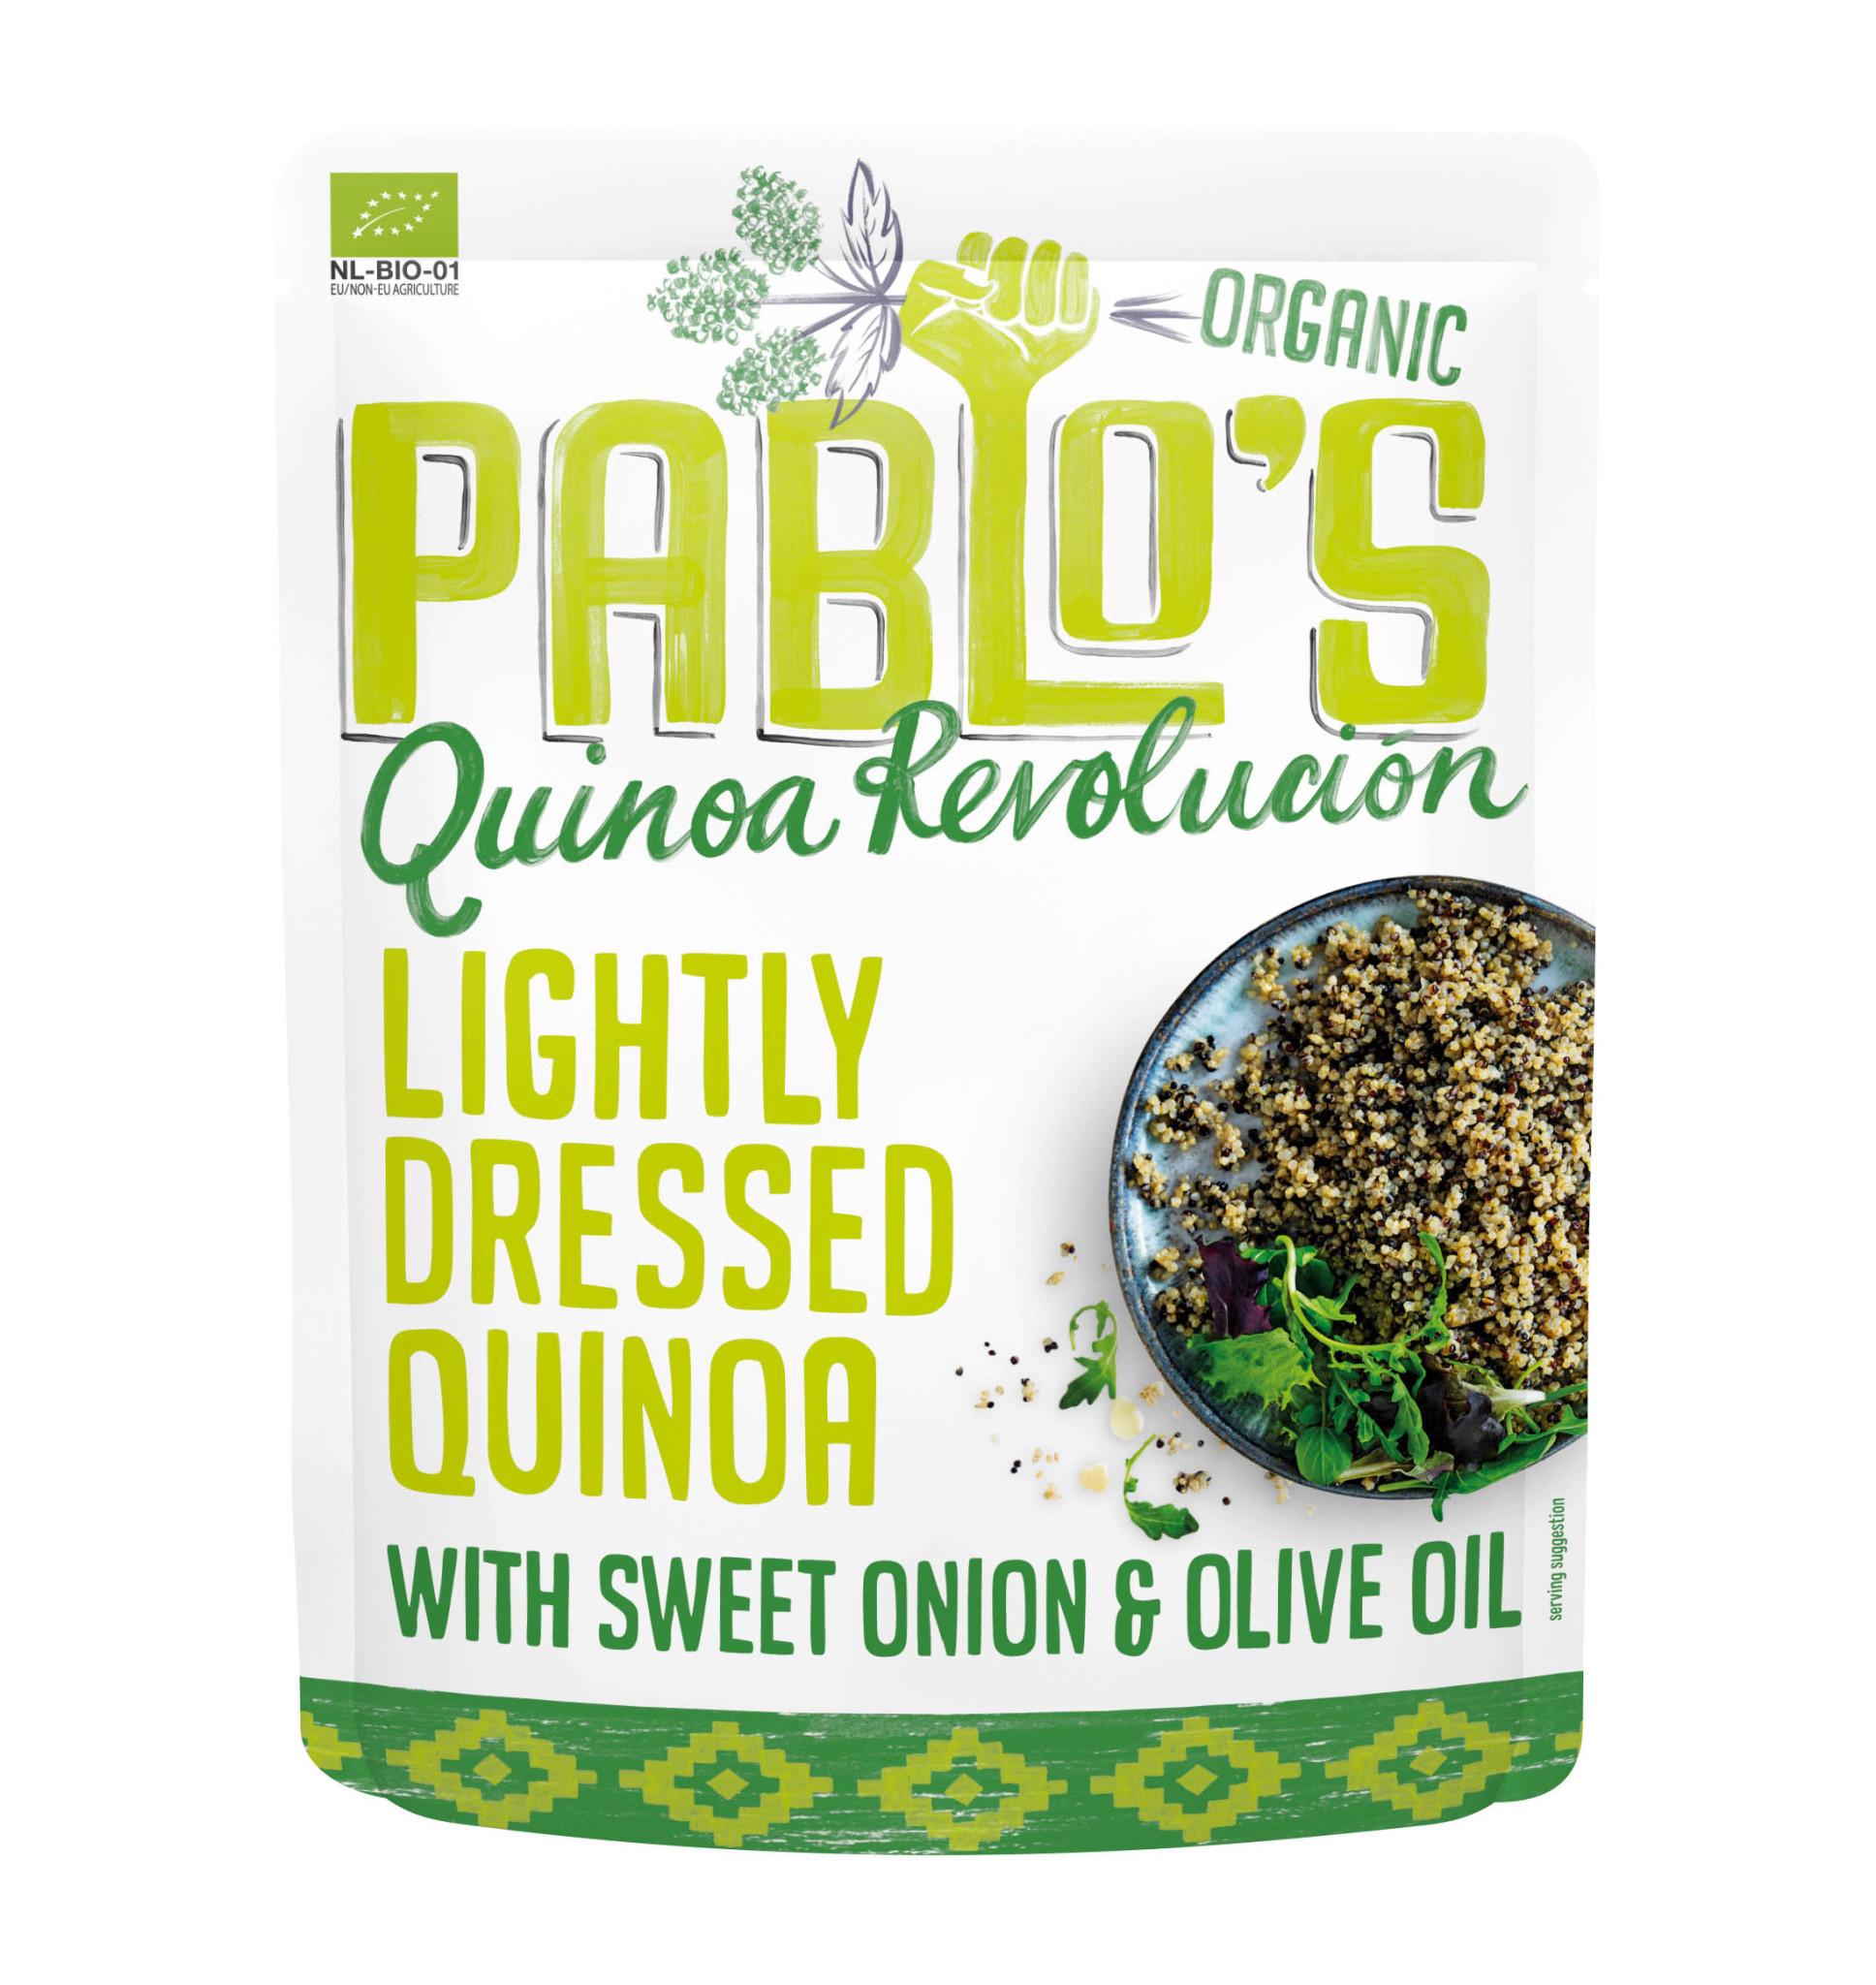 PABLO'S QUINOA PABLO'S QUINOA - Lightly Dressed Quinoa with Sweet Onion & Olive Oil